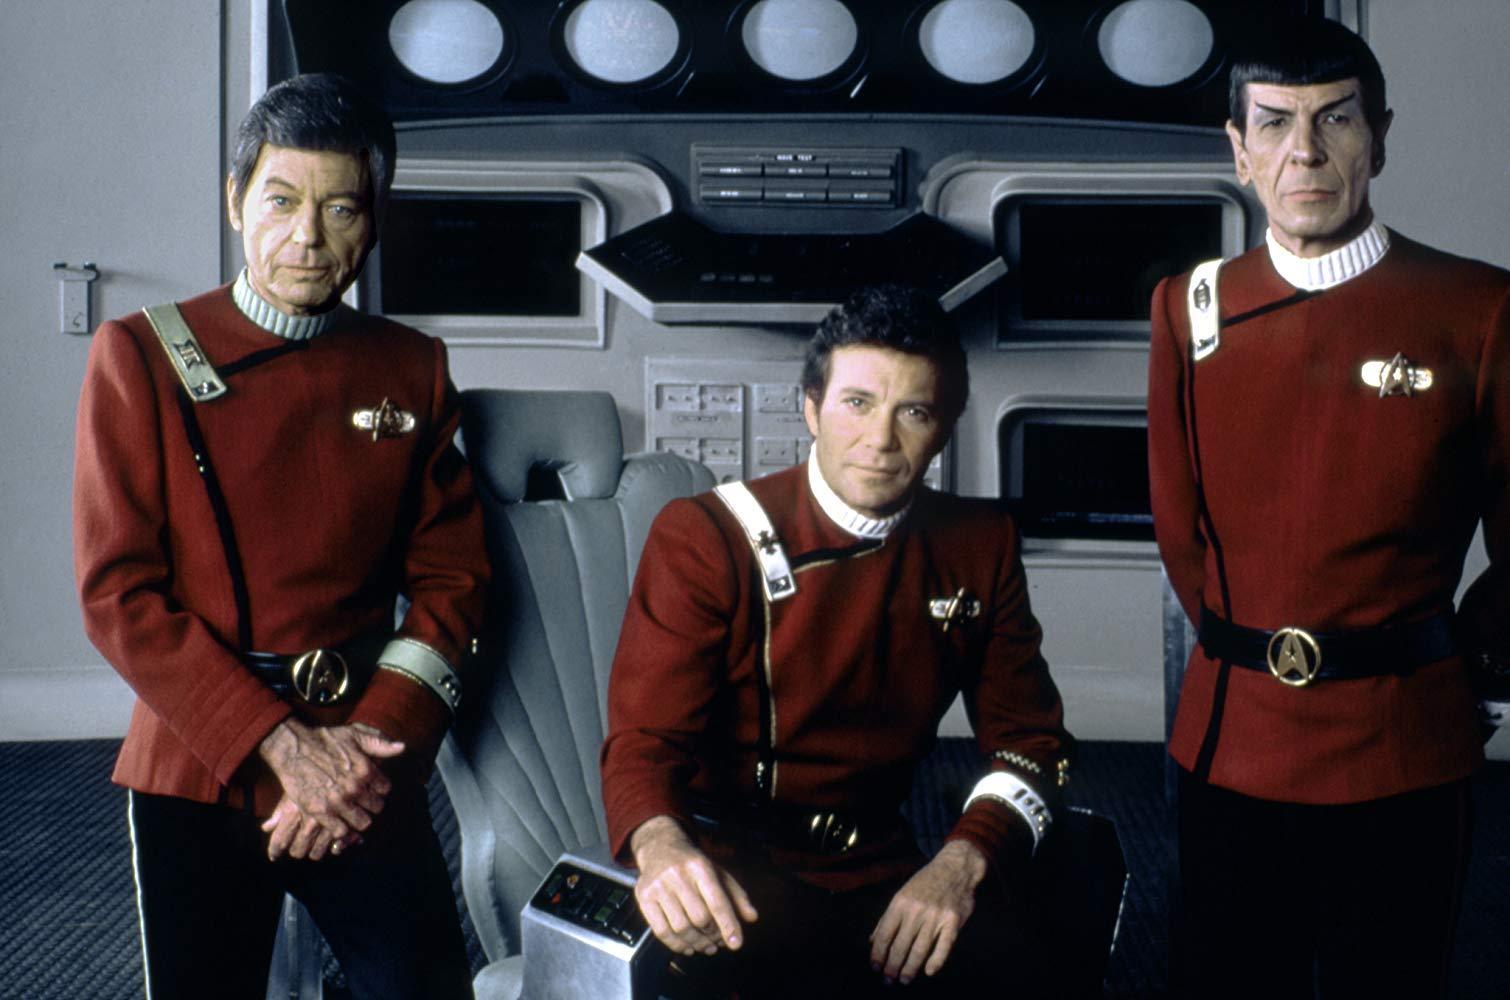 Dr McCoy (DeForest Kelley), Captain Kirk (William Shatner) and Mr Spock (Leonard Nimoy) in Star Trek II: The Wrath of Khan (1982)